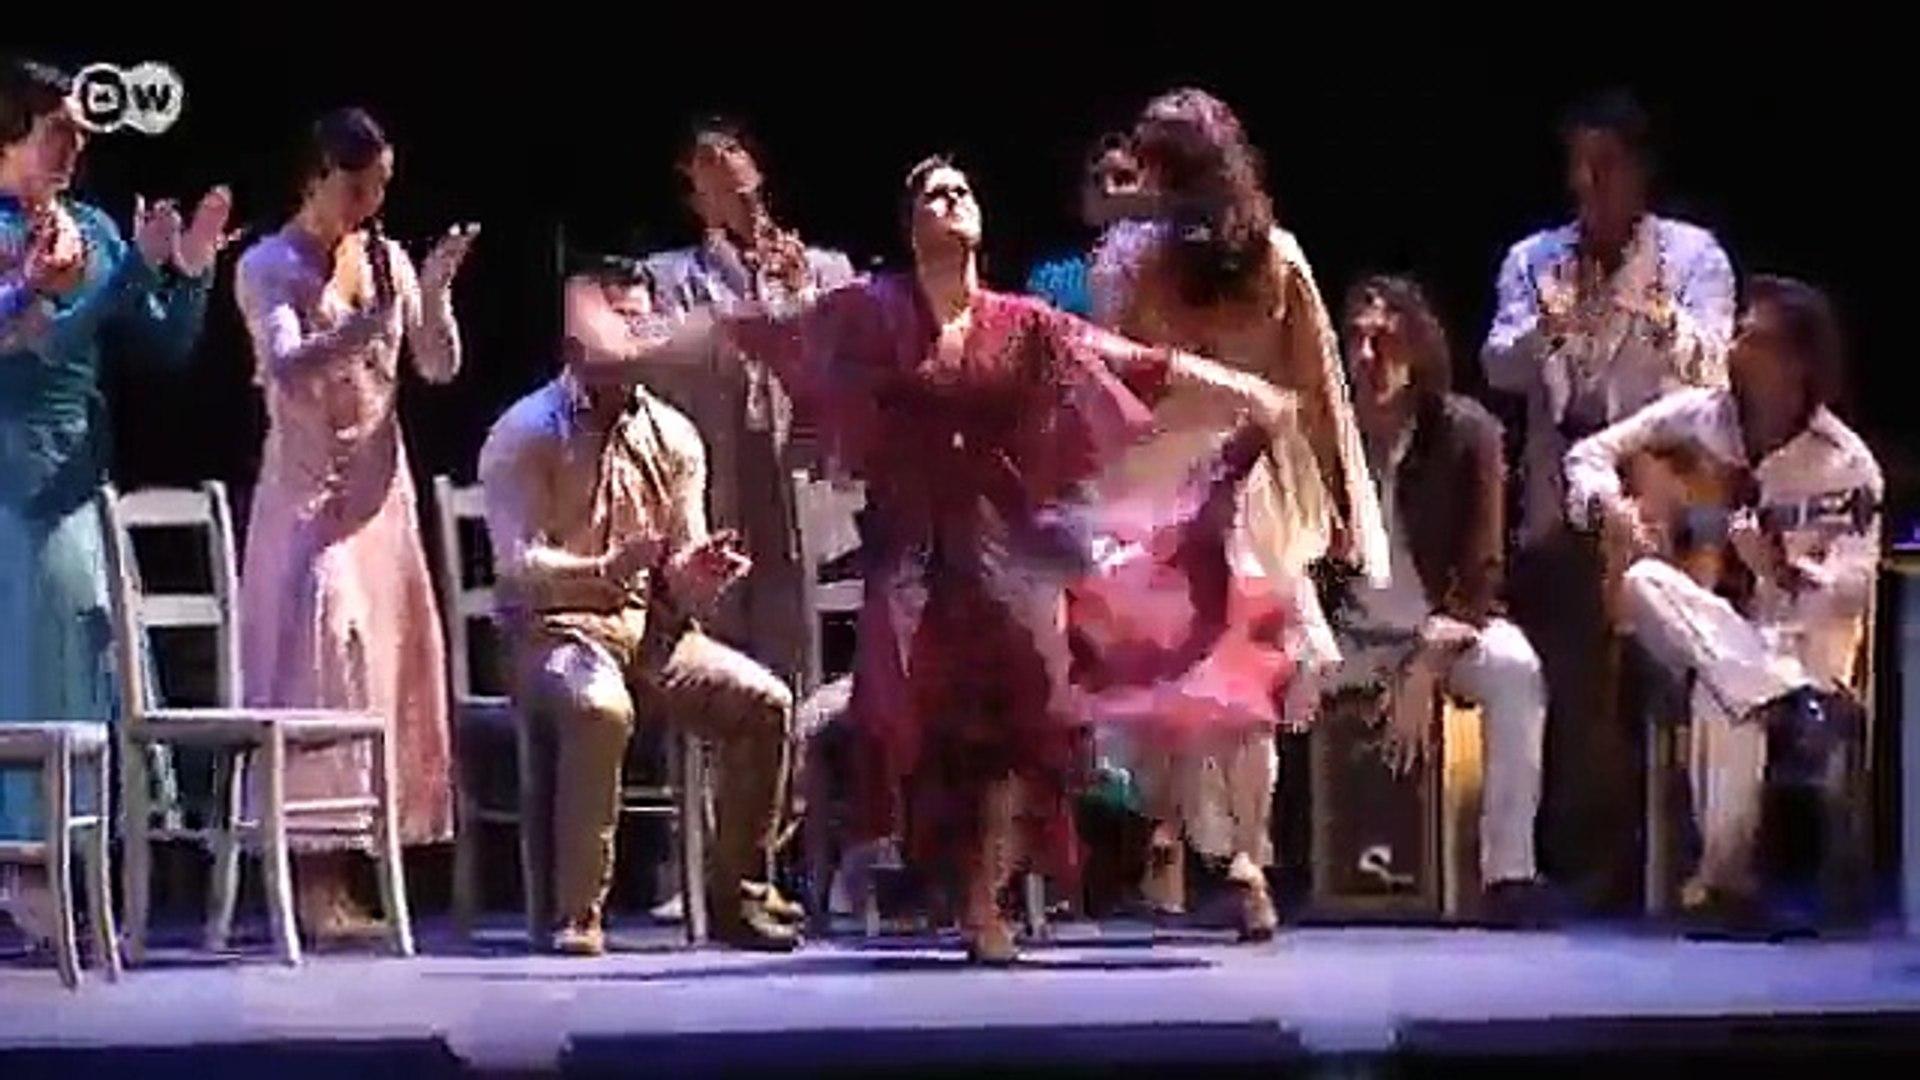 Festival de flamenco de Jerez | Euromaxx